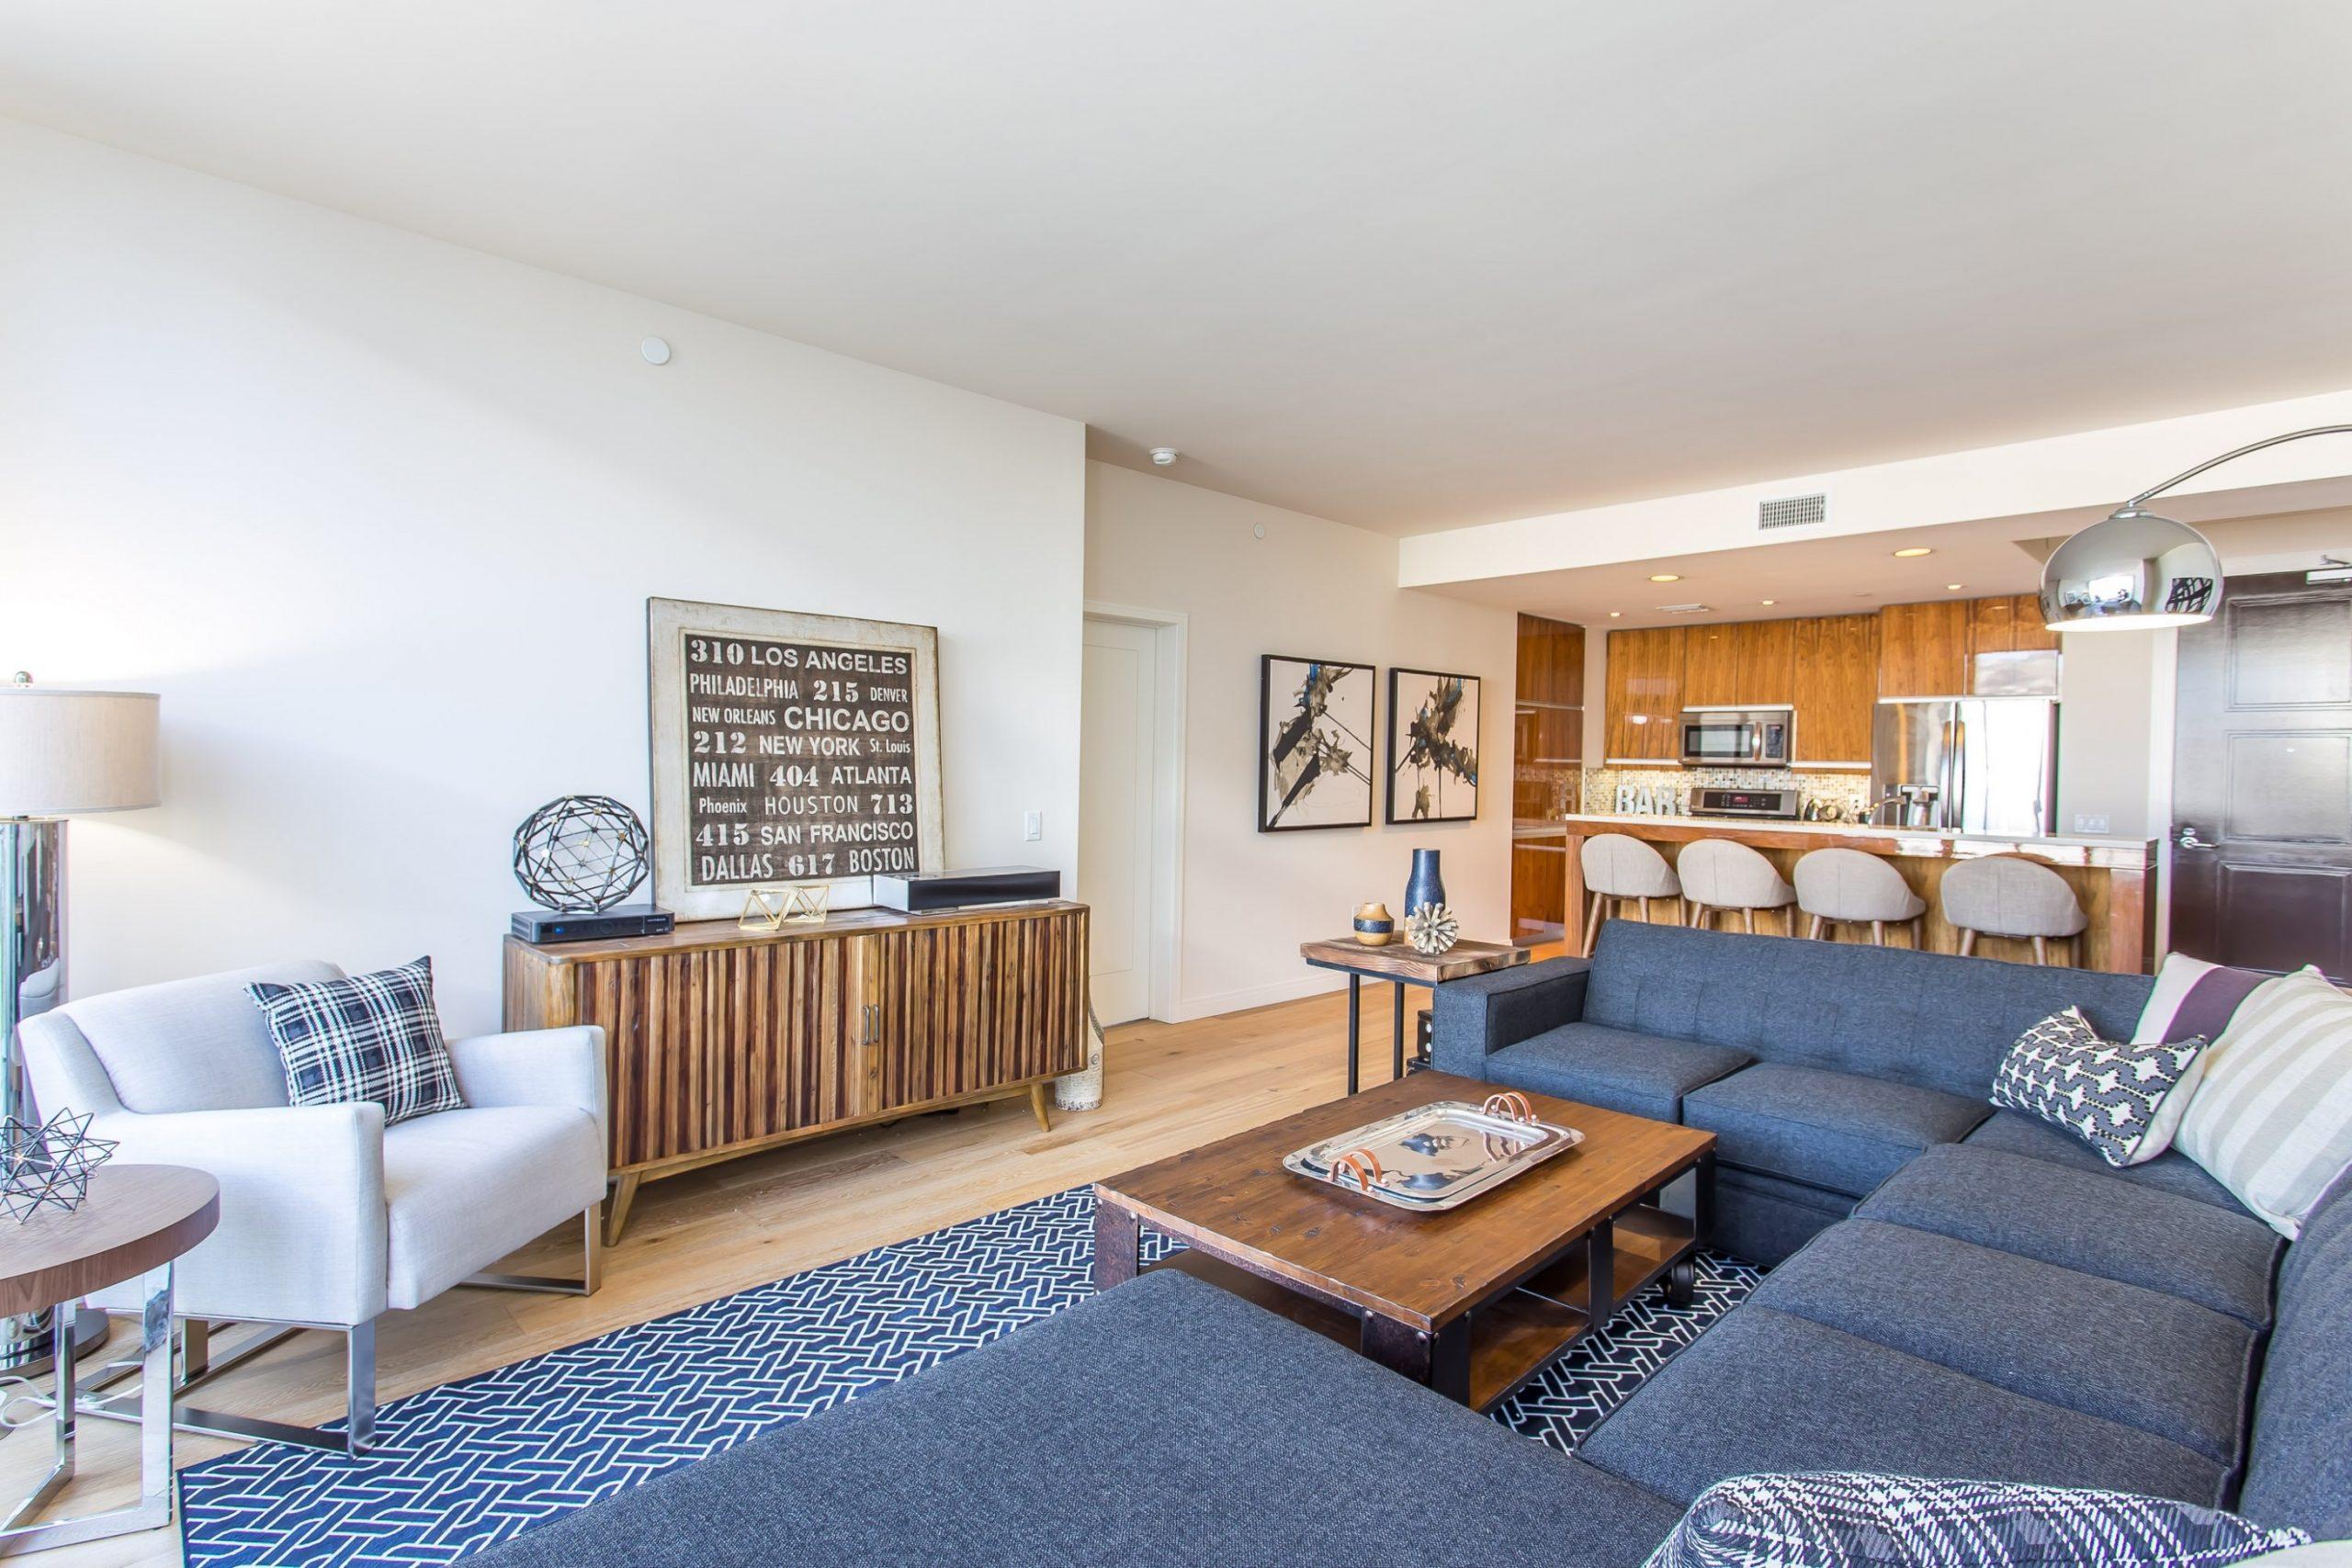 Apartment Decorating Ideas: 10 Ways to Transform Your Cookie-Cutter  - New Apartment Decorating Ideas